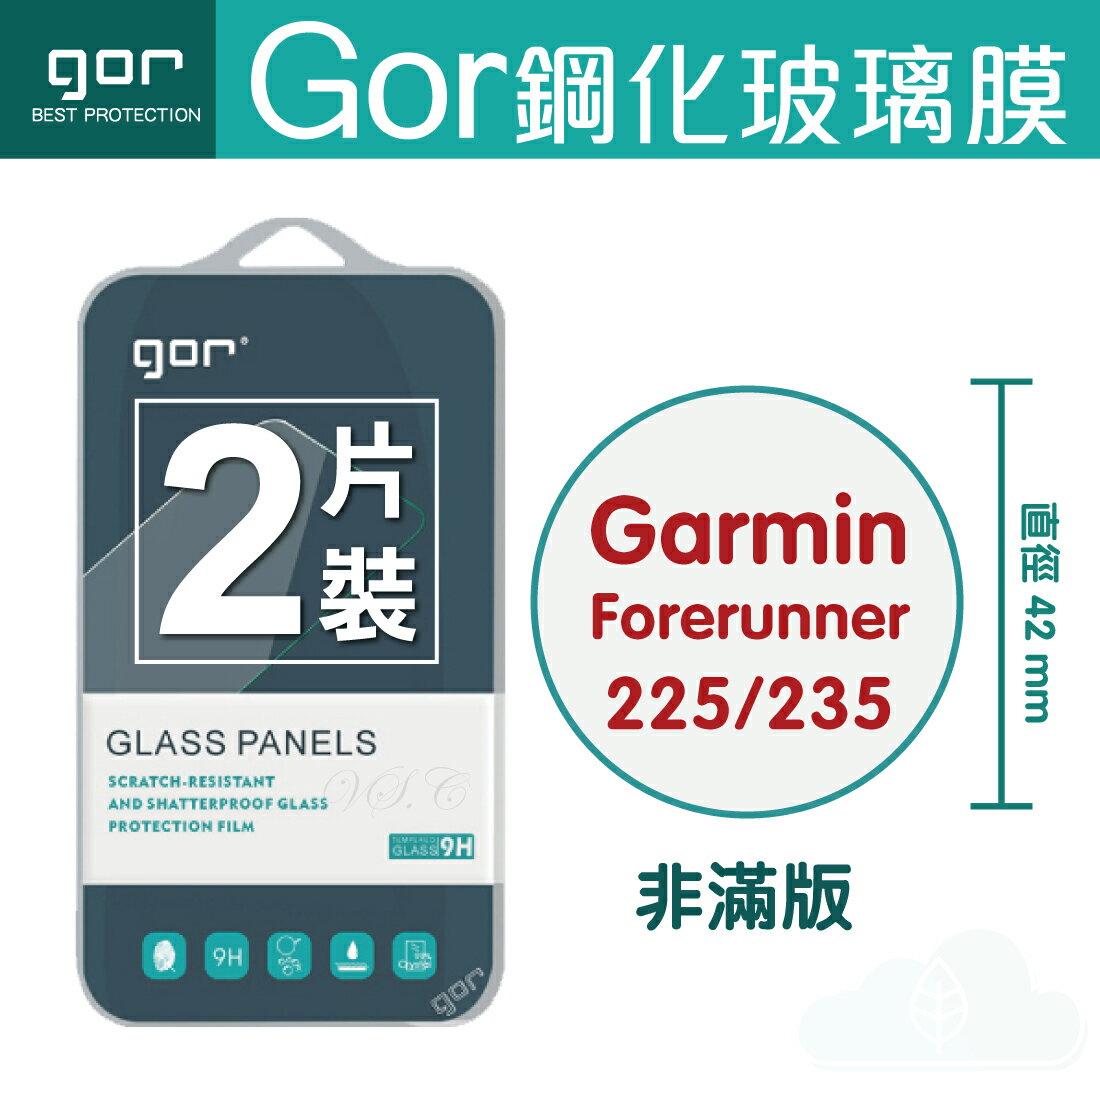 GOR 9H Garmin Forerunner 225/235 手錶玻璃 鋼化 保護貼 膜 佳明 運動手錶 滿299免運